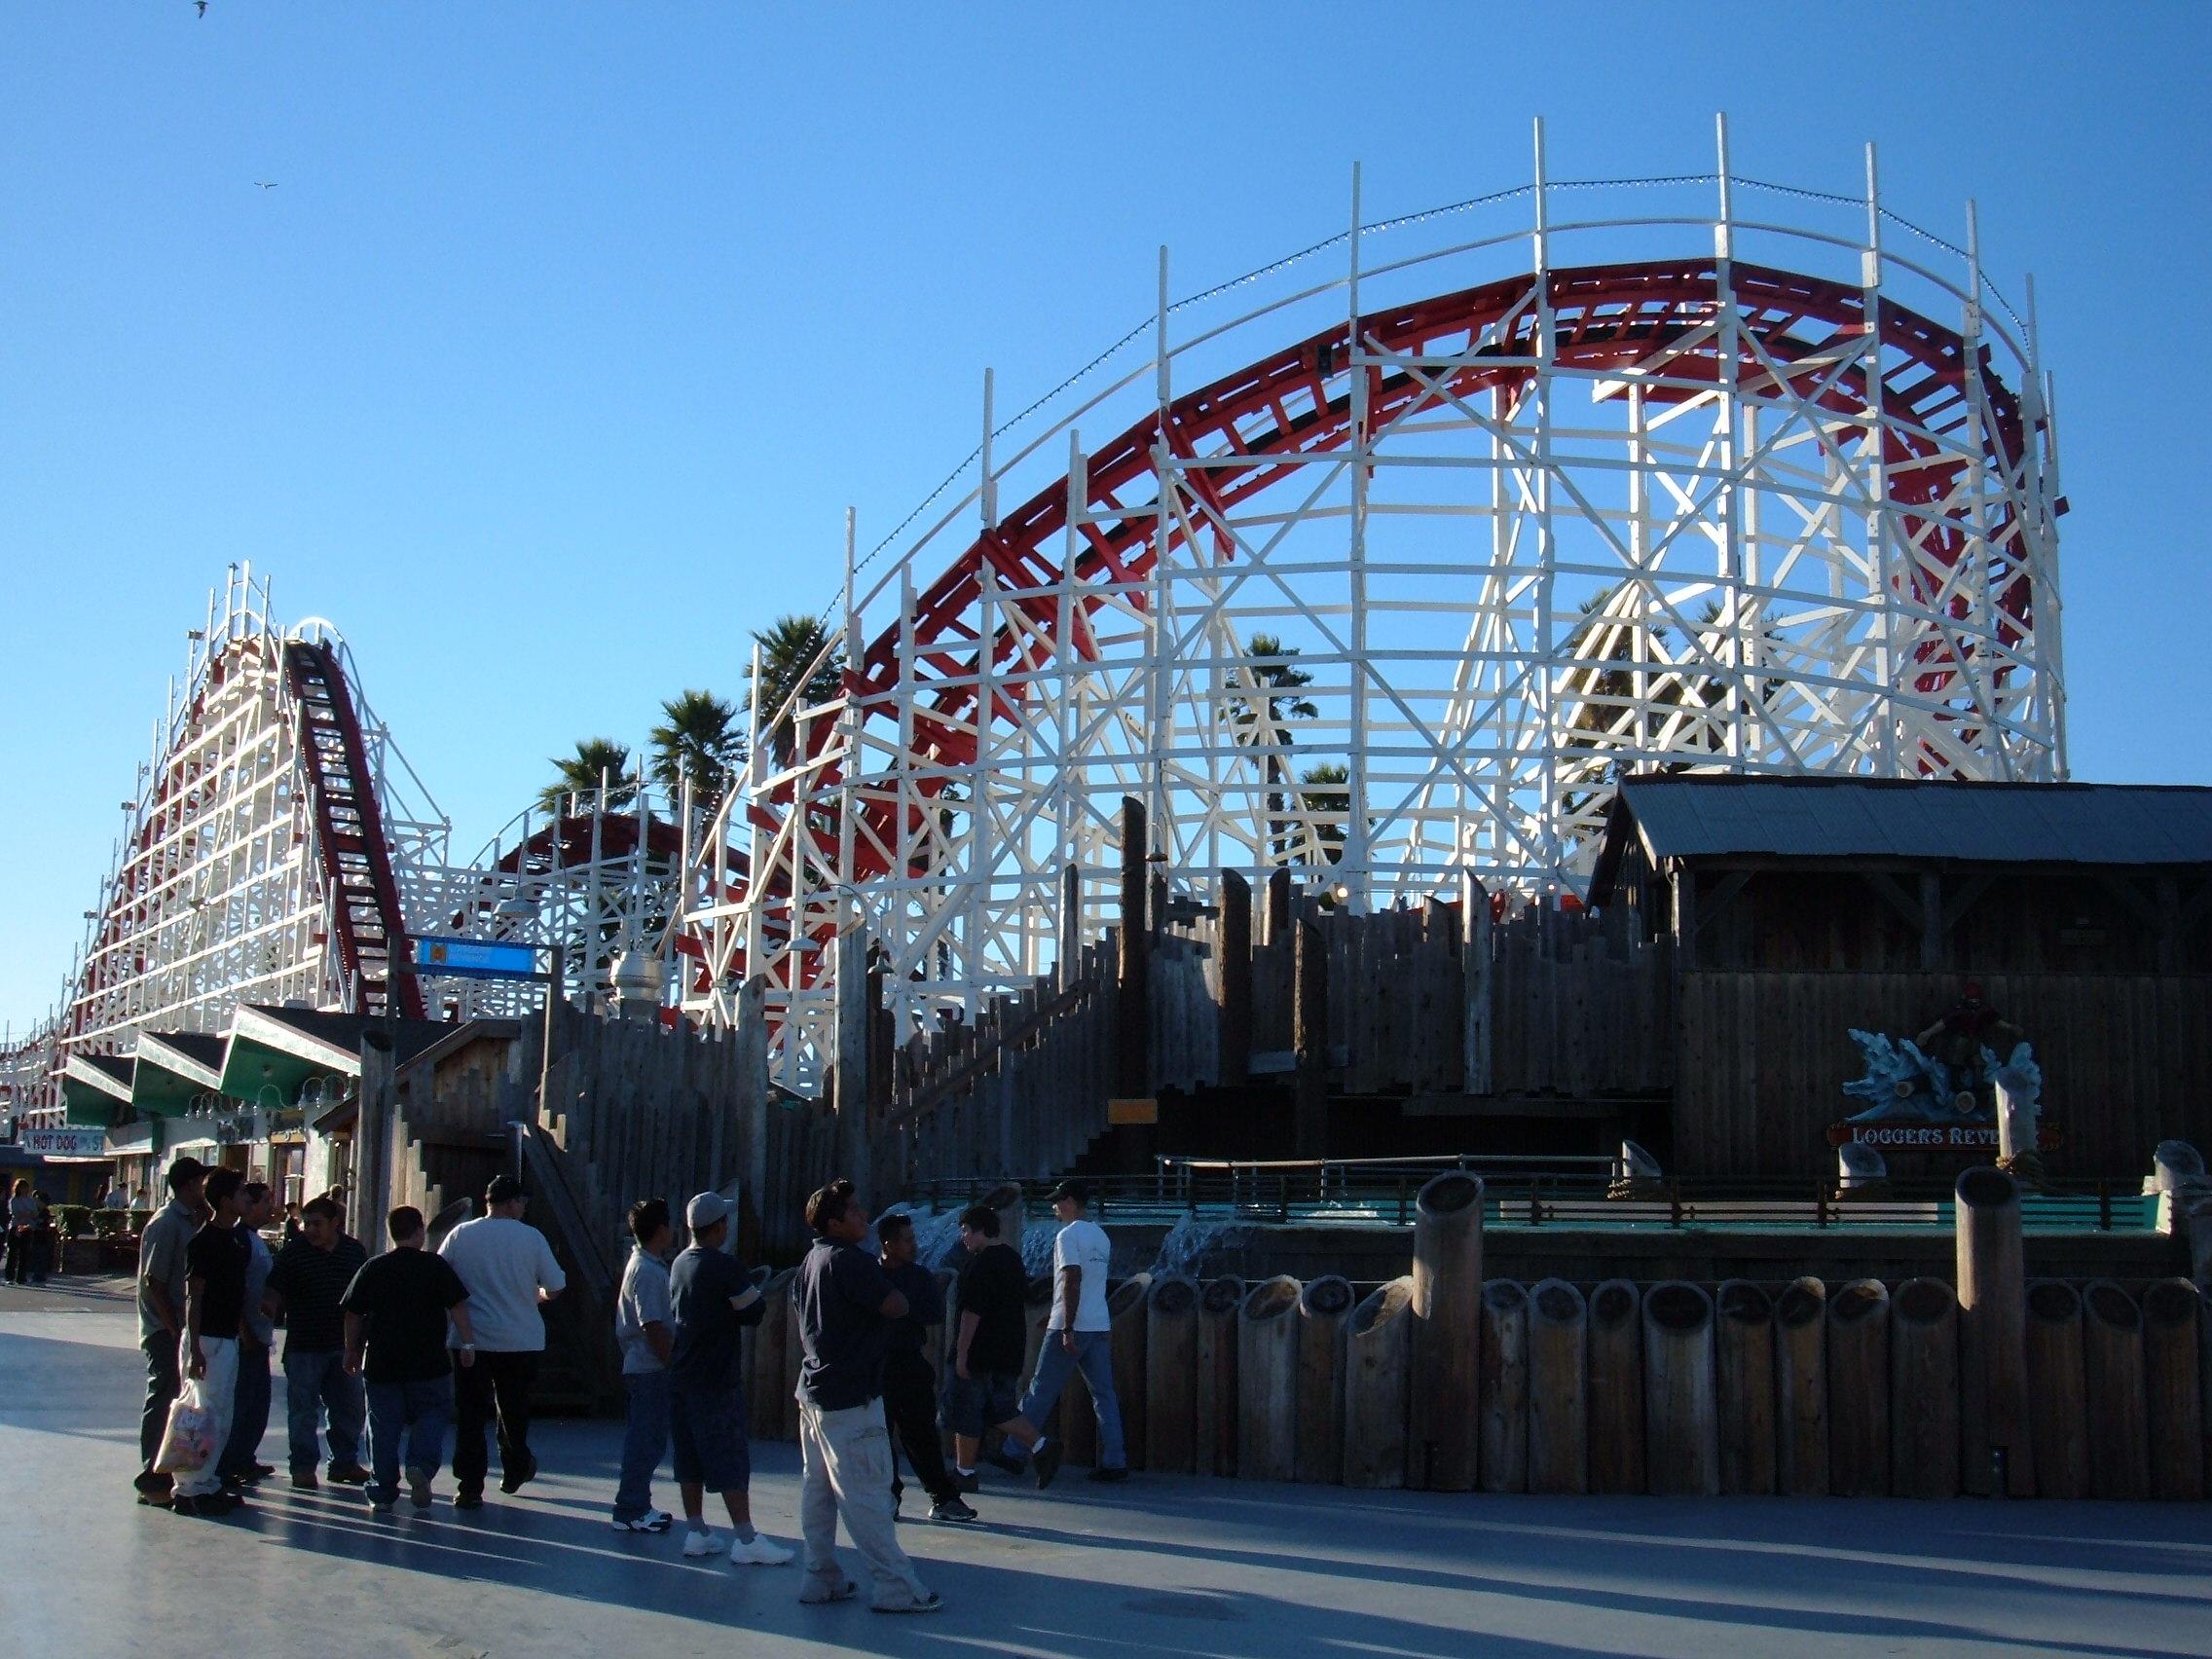 The Giant Dipper at the Santa Cruz Beach Board...